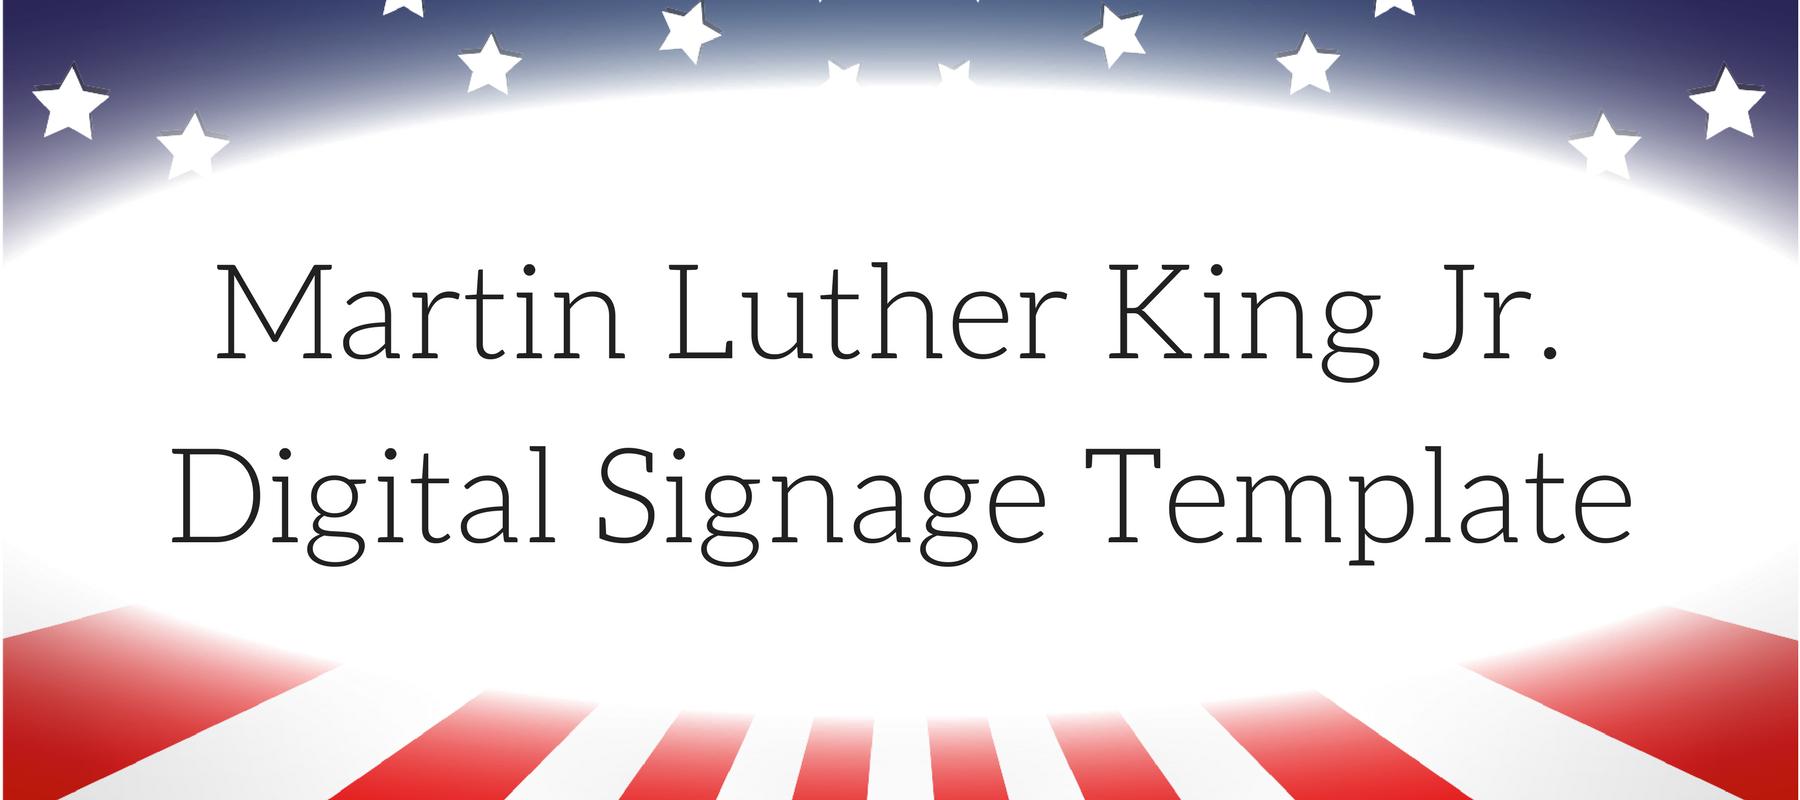 Martin Luther King Jr. Digital Signage Template